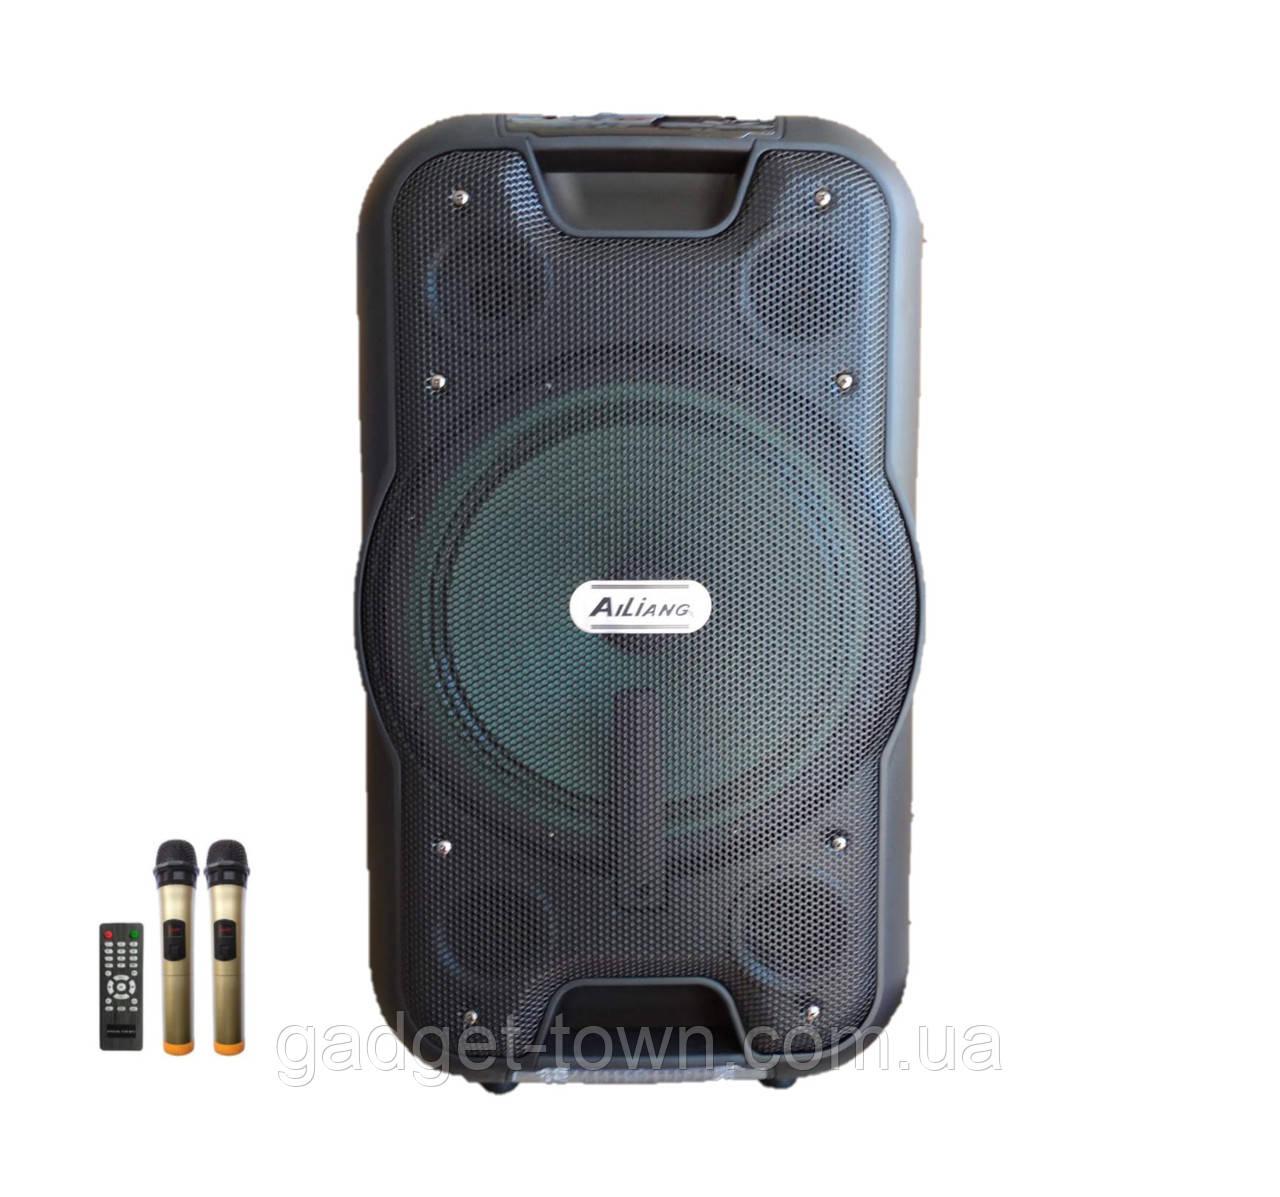 Колонка акумуляторна Ailiang UF-2112 c радіомікрофонами (100W/USB/BT/FM)